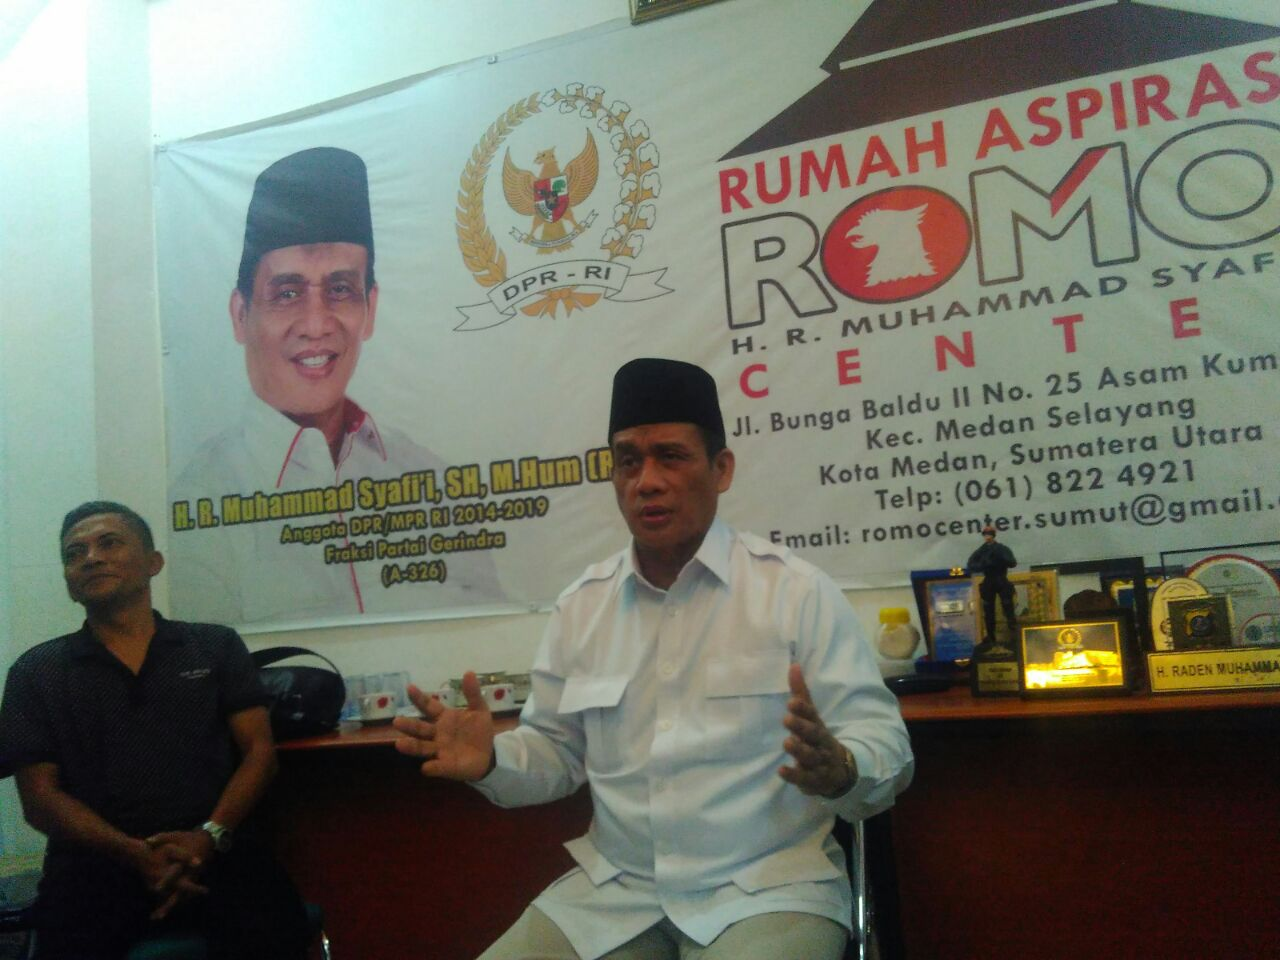 Raden Muhammad Syafii (Romo)